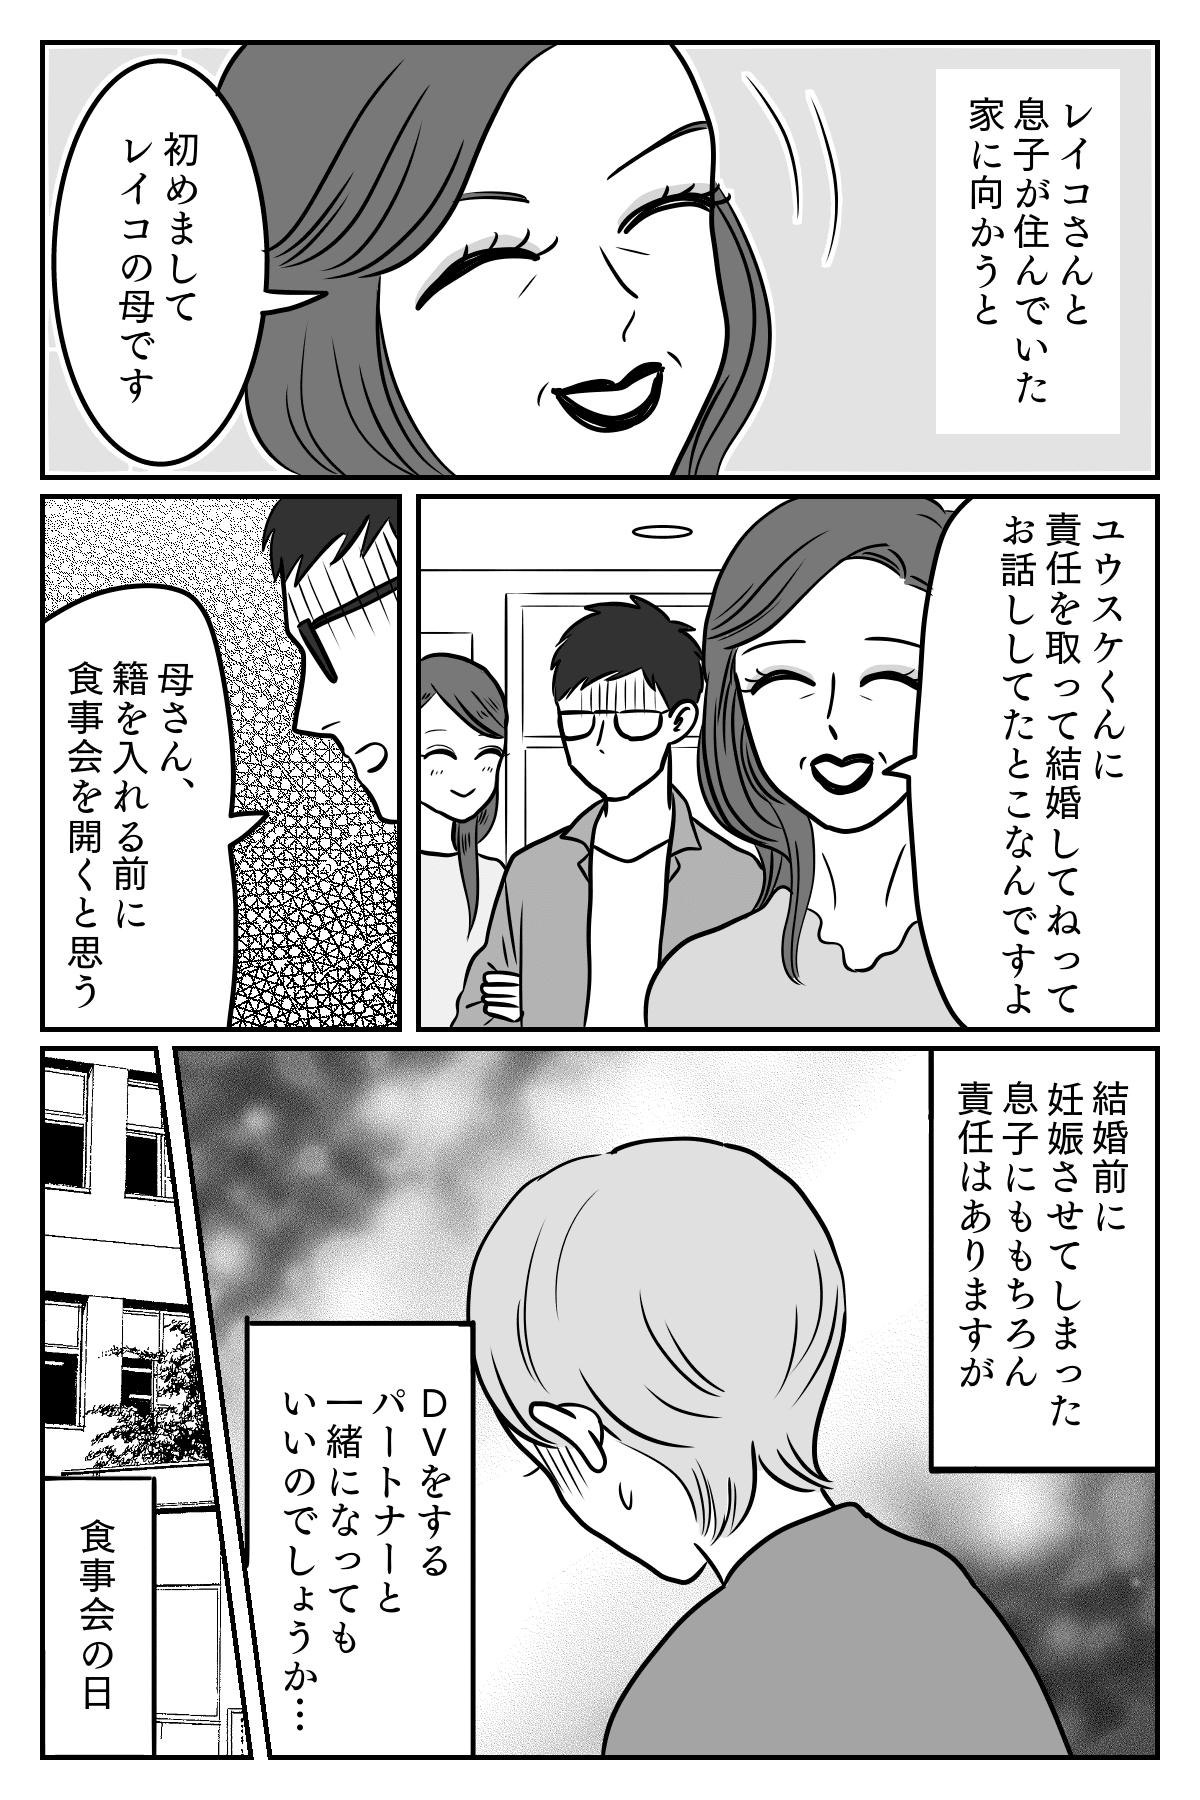 DV3-2